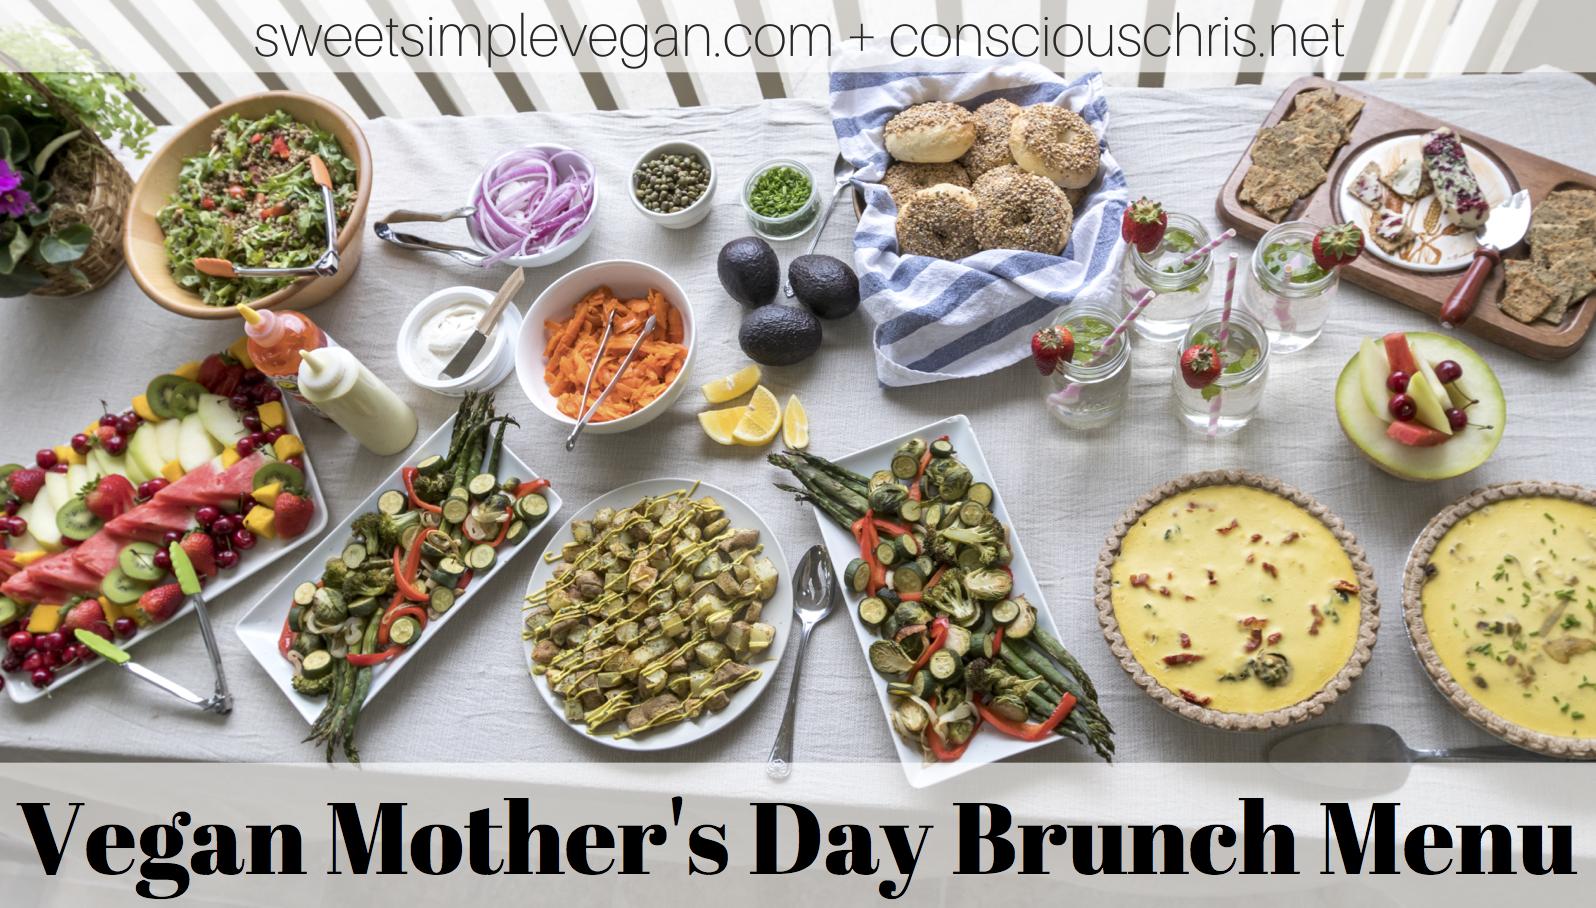 Vegan Mother's Day Brunch Menu & Recap 2016 | sweetsimplevegan.com